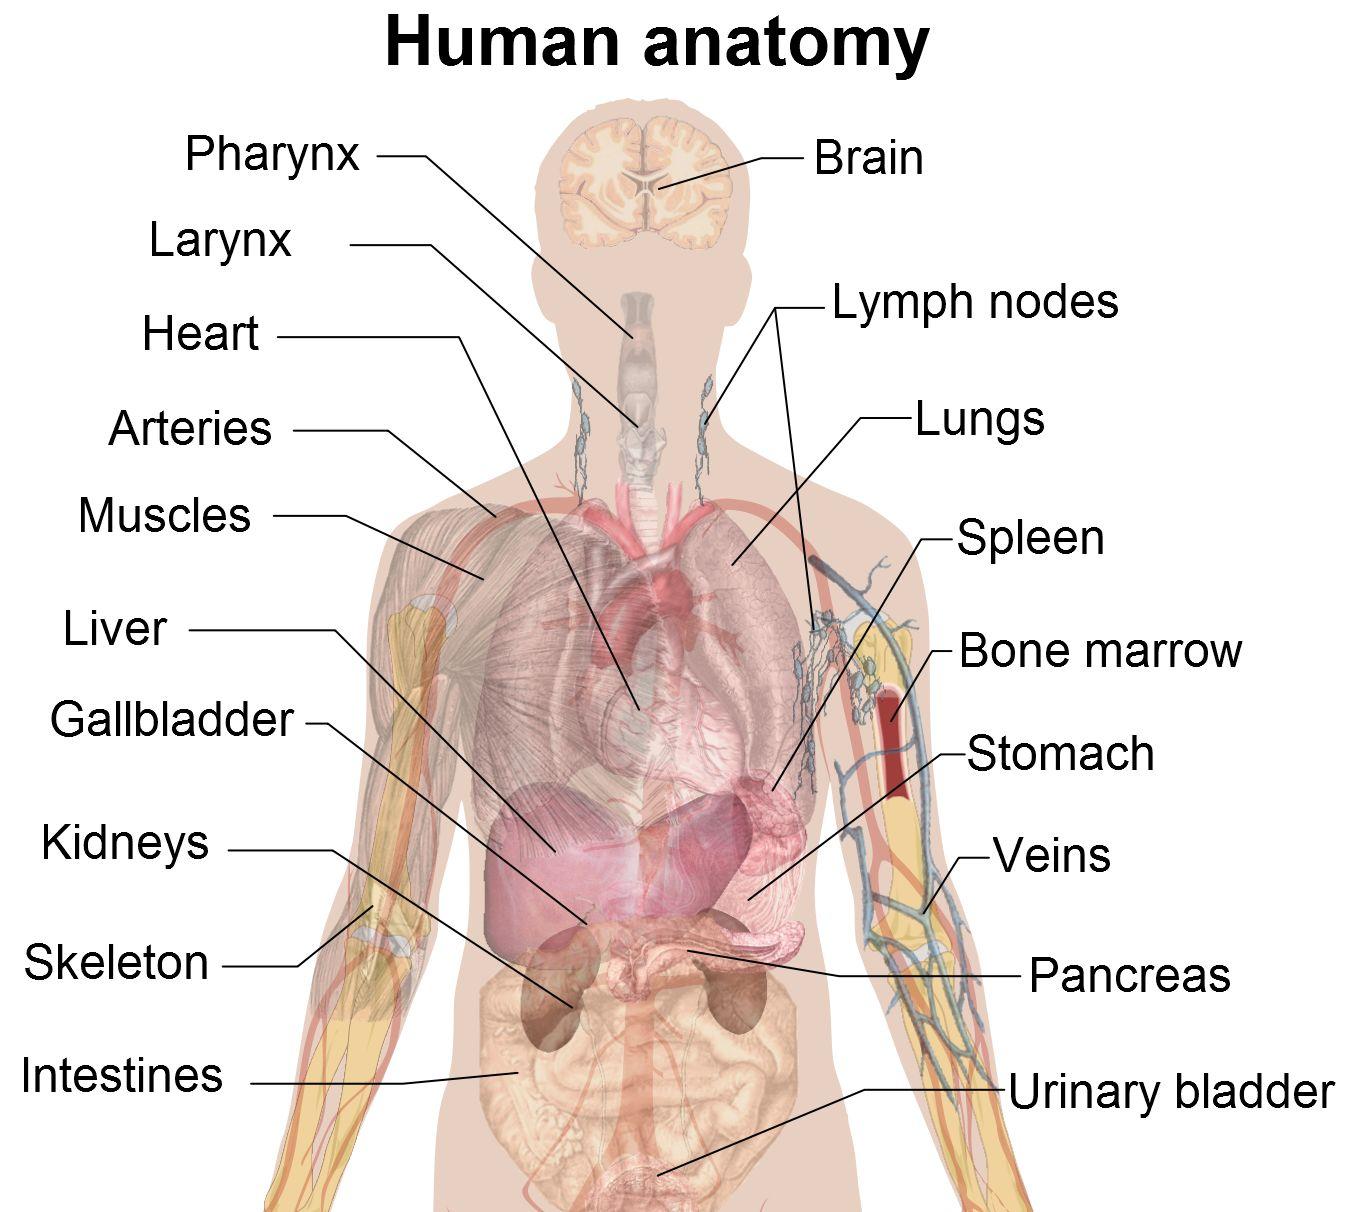 Diagram Of The Kidney In The Human Body 26danishfashion Mode